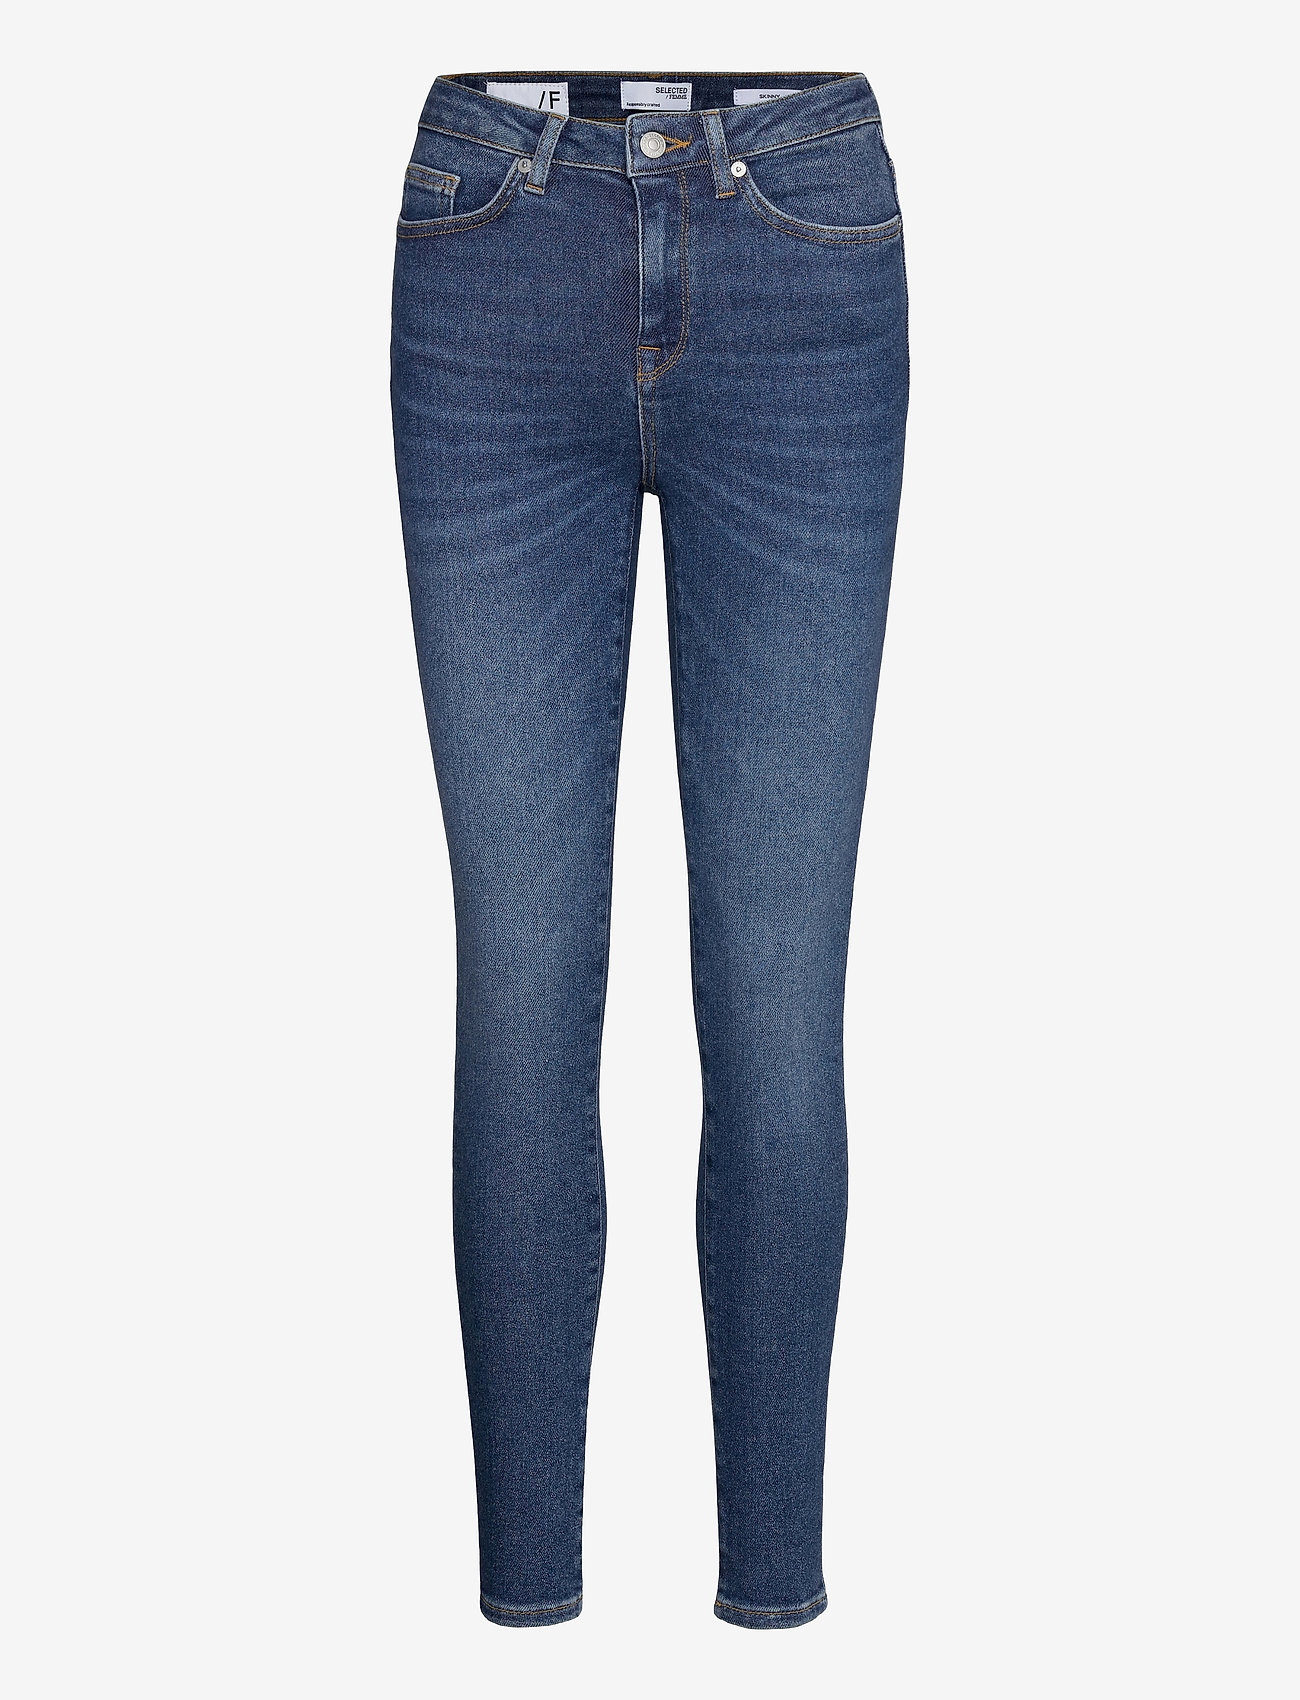 Selected Femme - SLFSOPHIA MW SKINNY DARK BLU JEAN U - skinny jeans - dark blue denim - 0